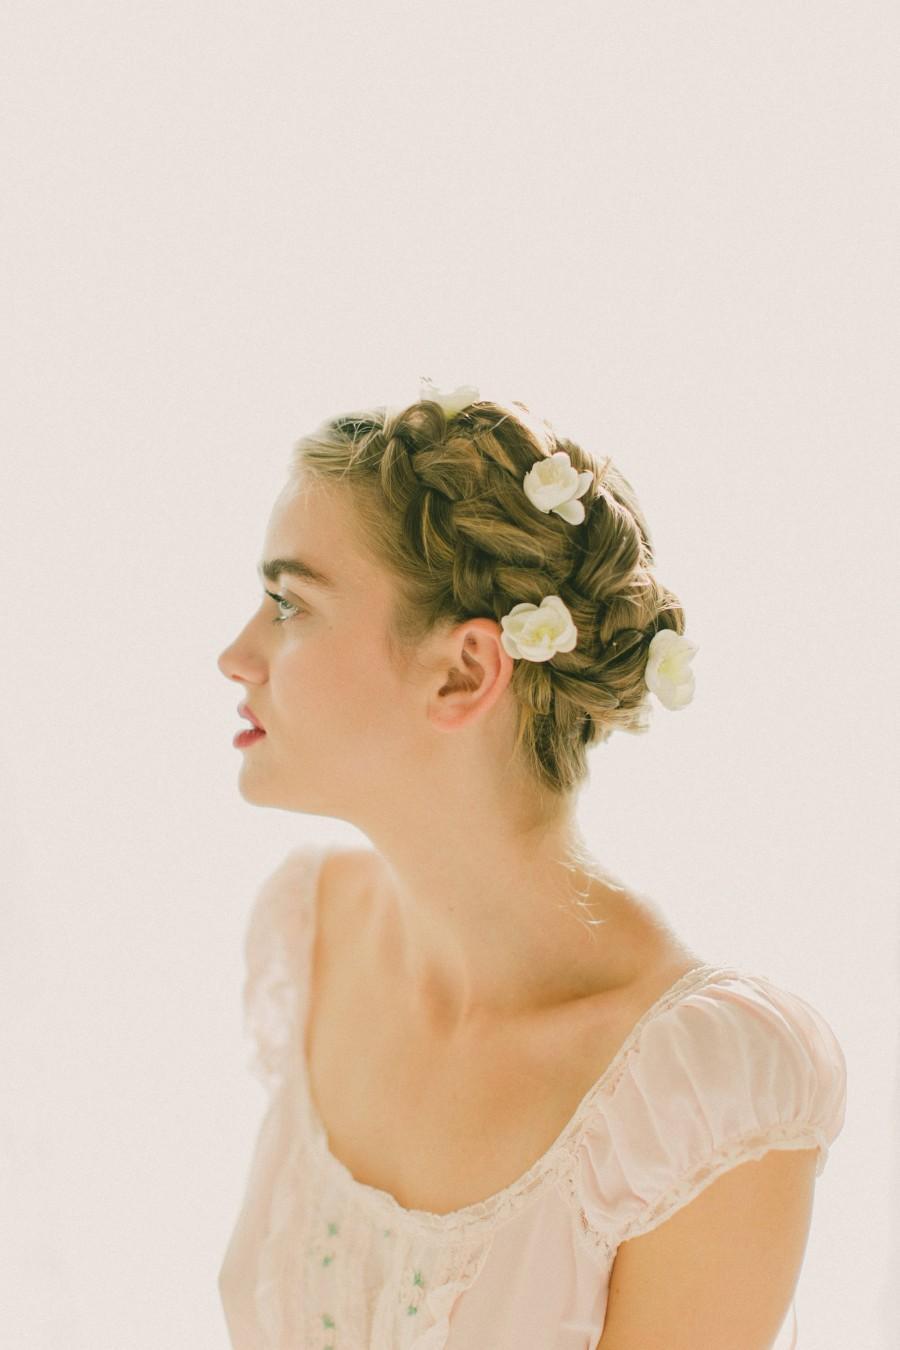 Свадьба - White or Pink flower bobby pins, Flower hair clips, Bridal bobbies, White floral pin set, Up-do braid flowers, Bobby pin set - (SET of 6)